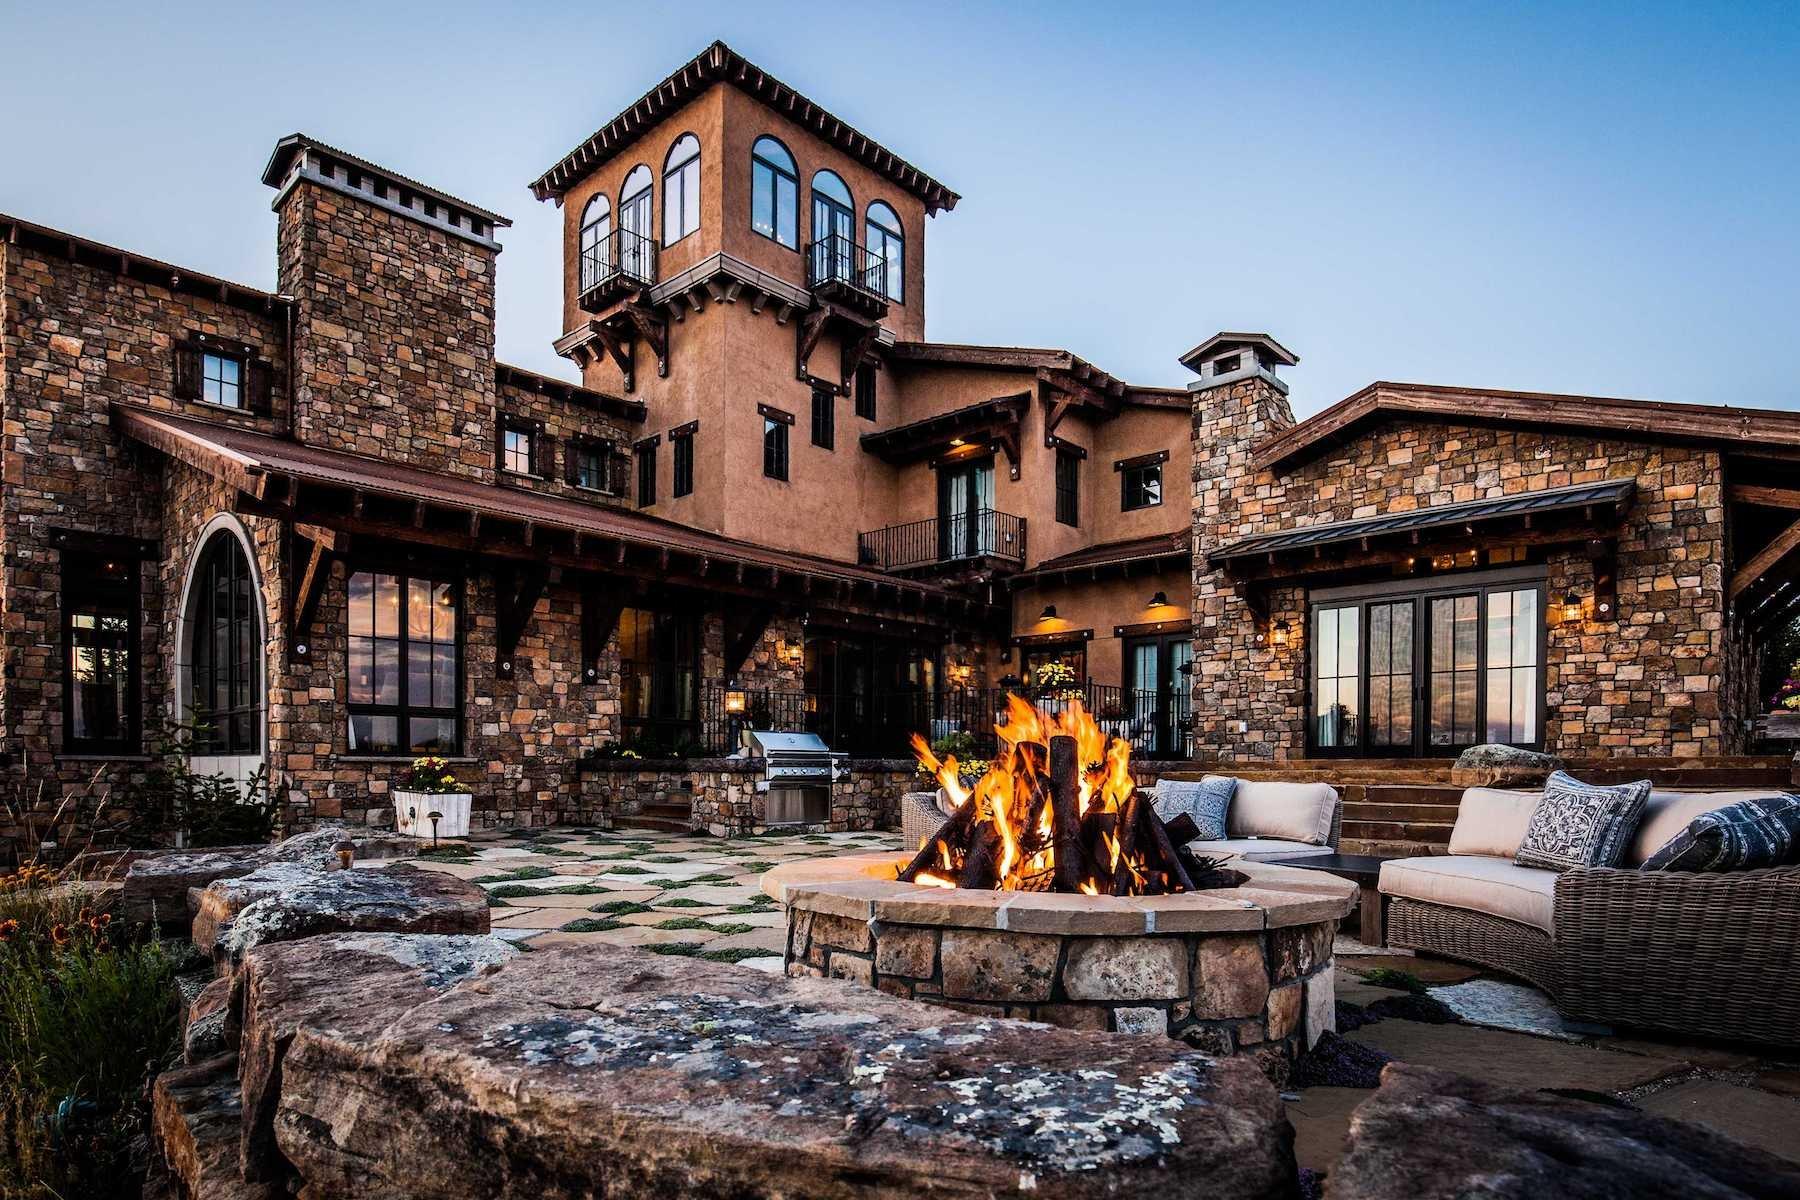 fire-pit-patio-stone